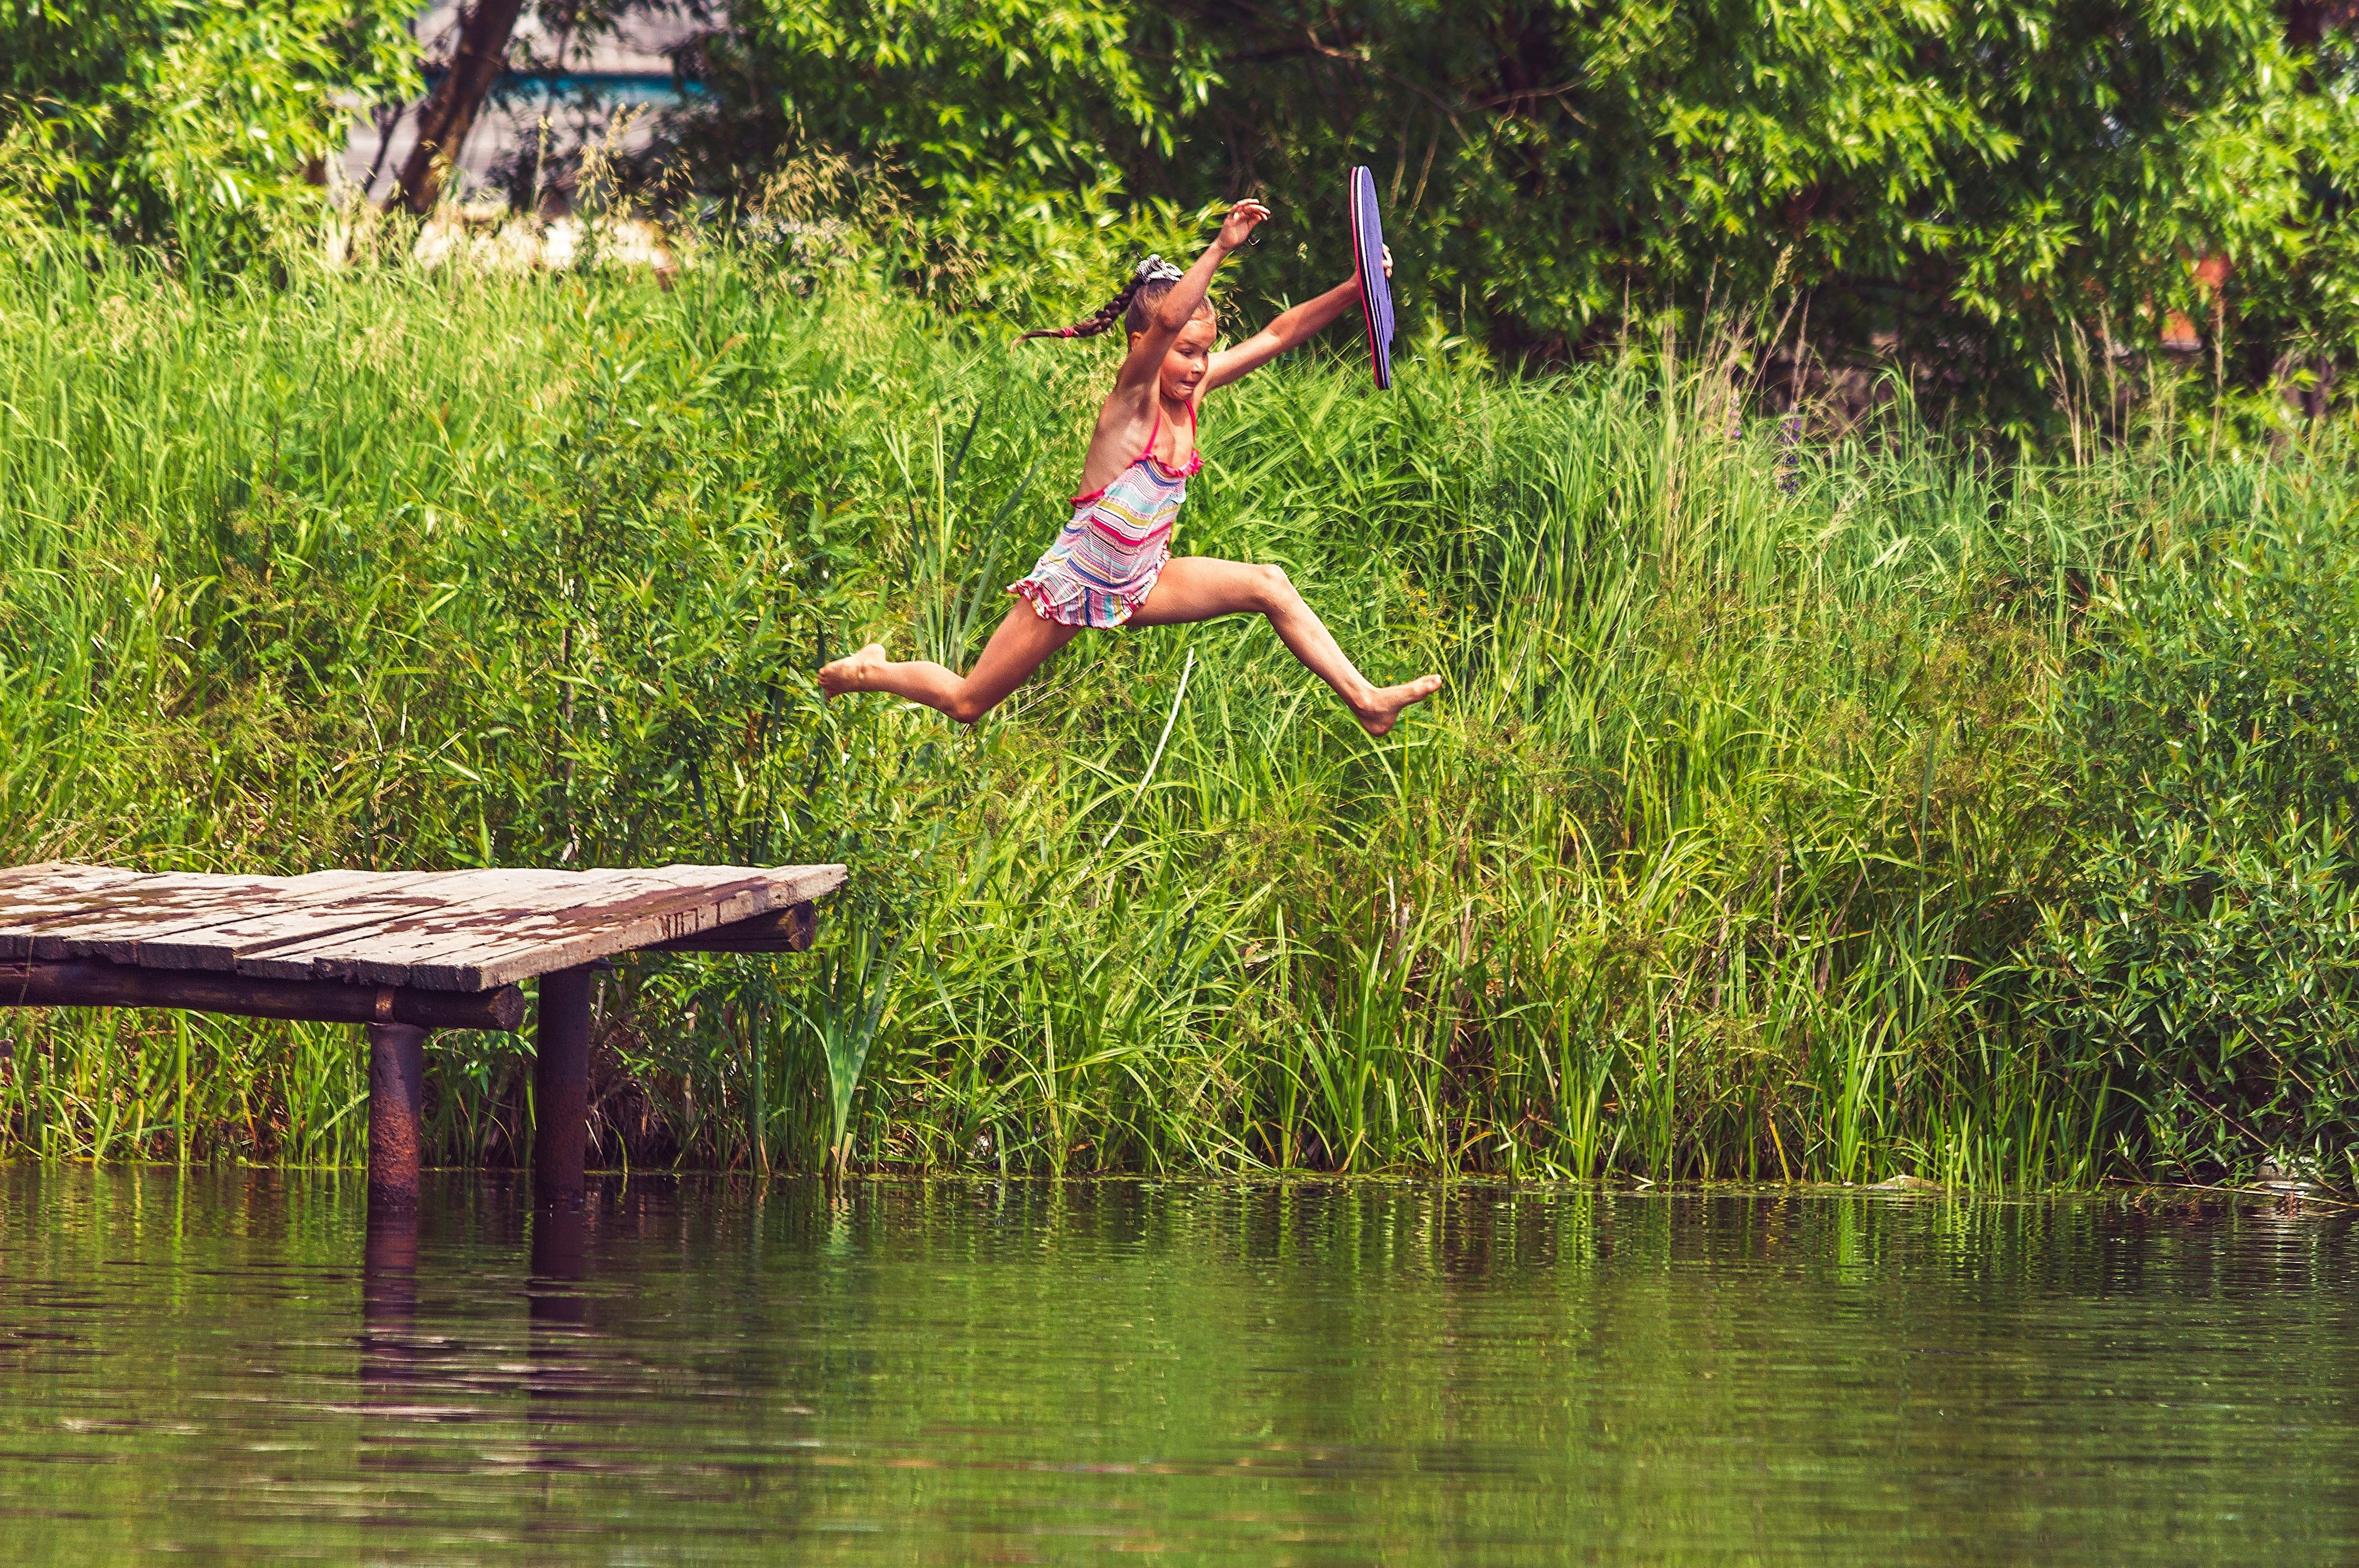 Mergaitė šoka į vandenį